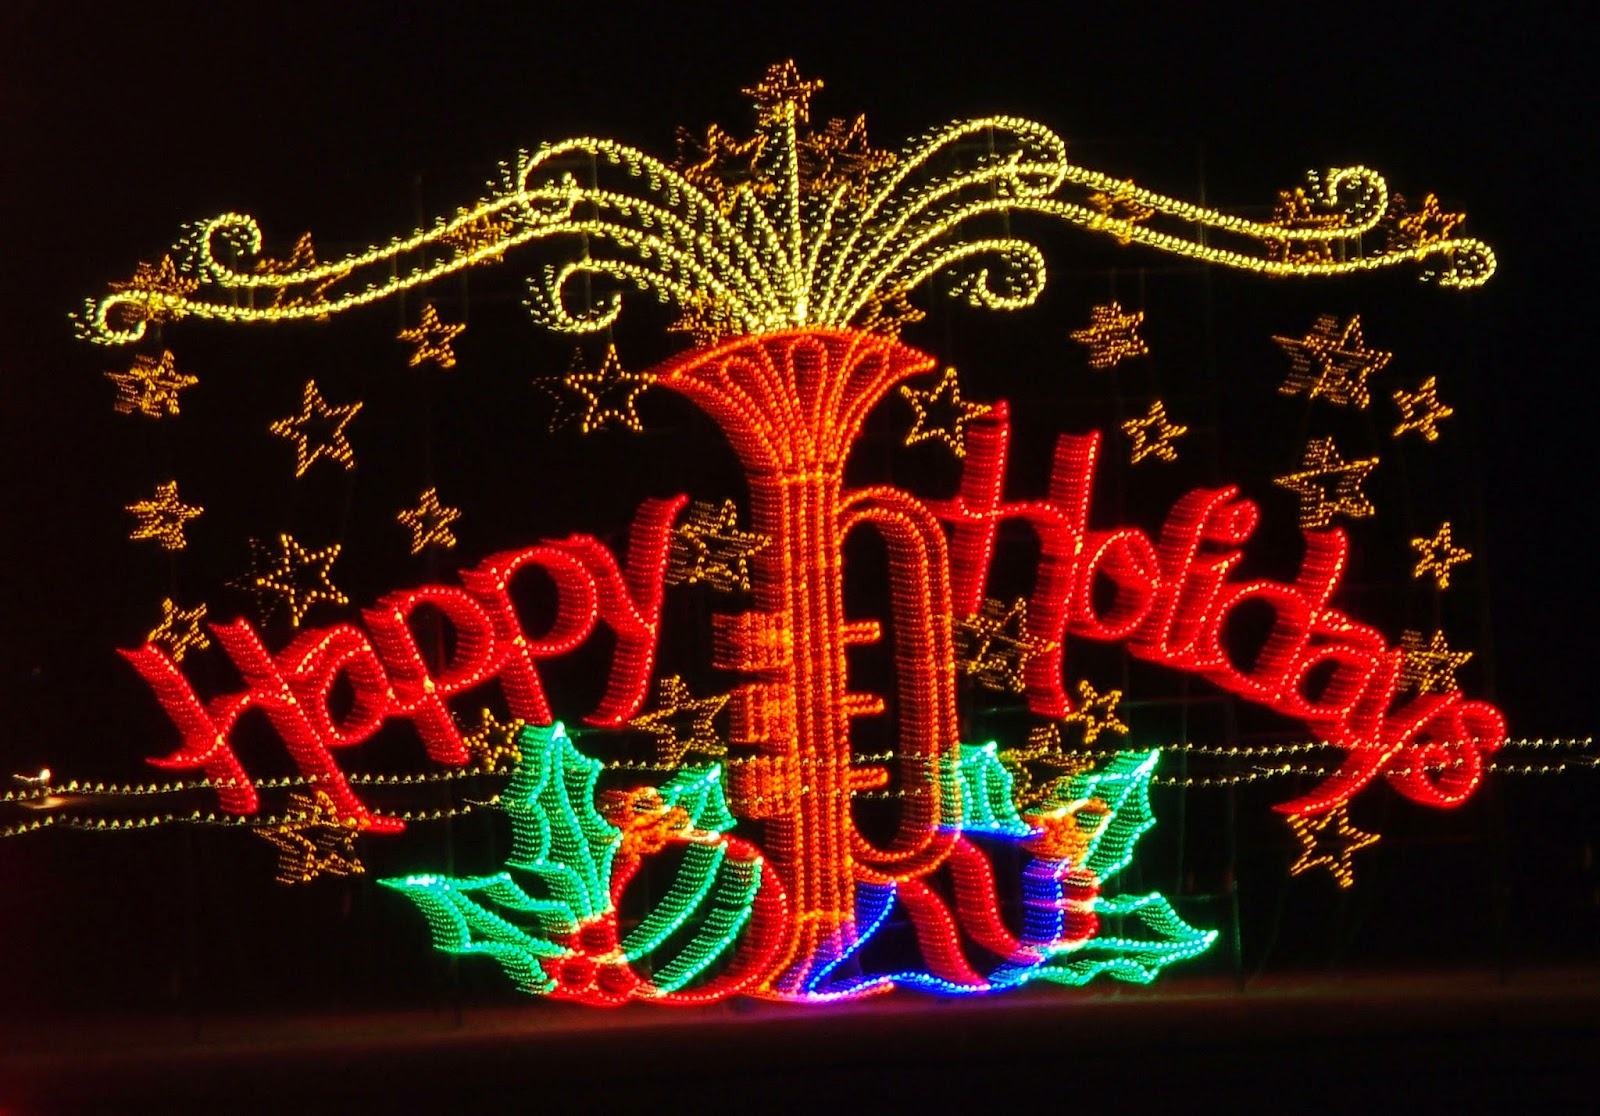 Happy Holidays | Navigating Hectivity by Micki Bare